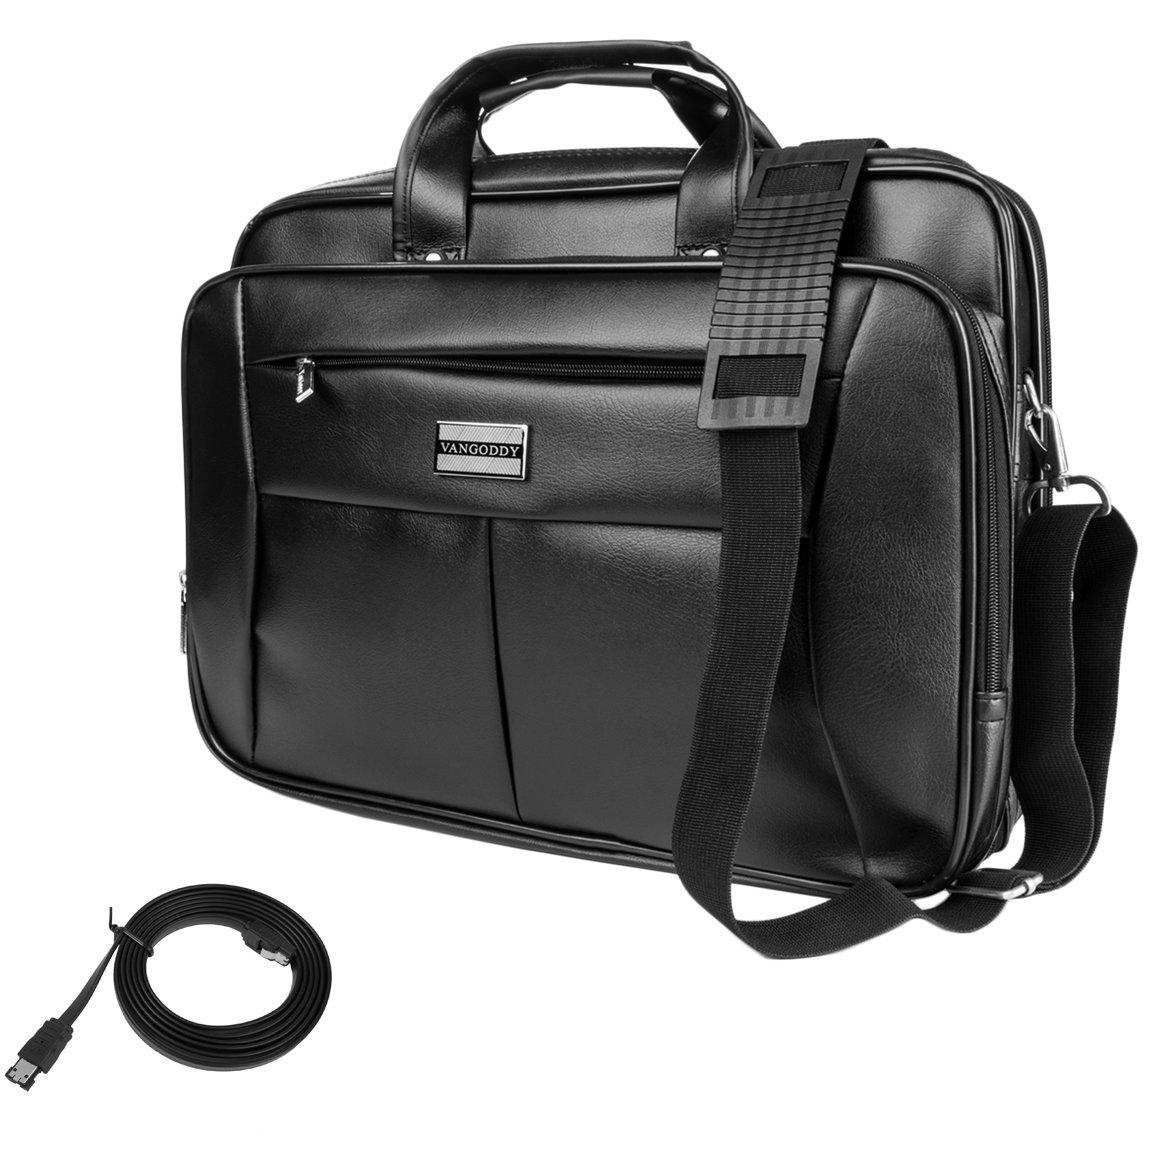 15.6 inch Vangoddy 2 in 1 Multipurpose Black Shoulder Strap Travel Carrying Barrow Laptop Bag - HP EliteBook 755 G2 + Sumaclife SATA-eSATA 5' -Black